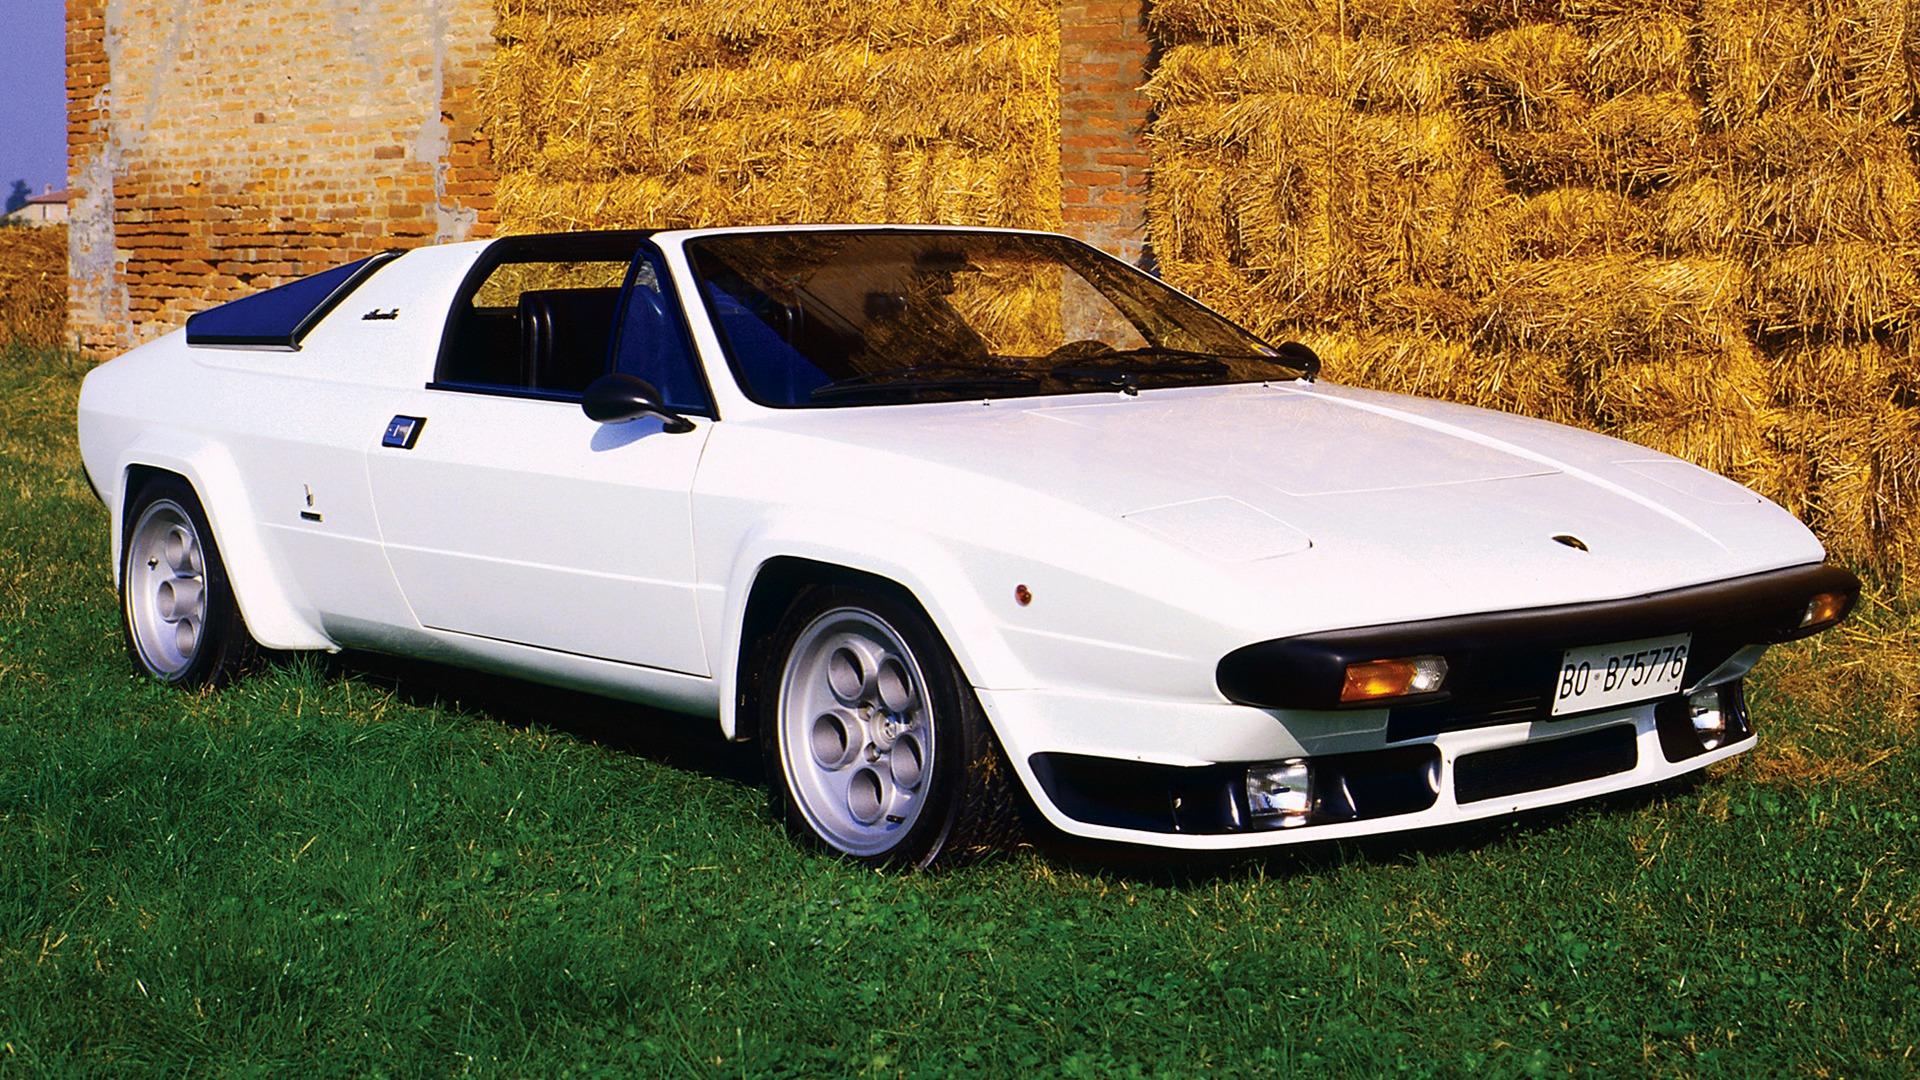 Lamborghini – Silhouette